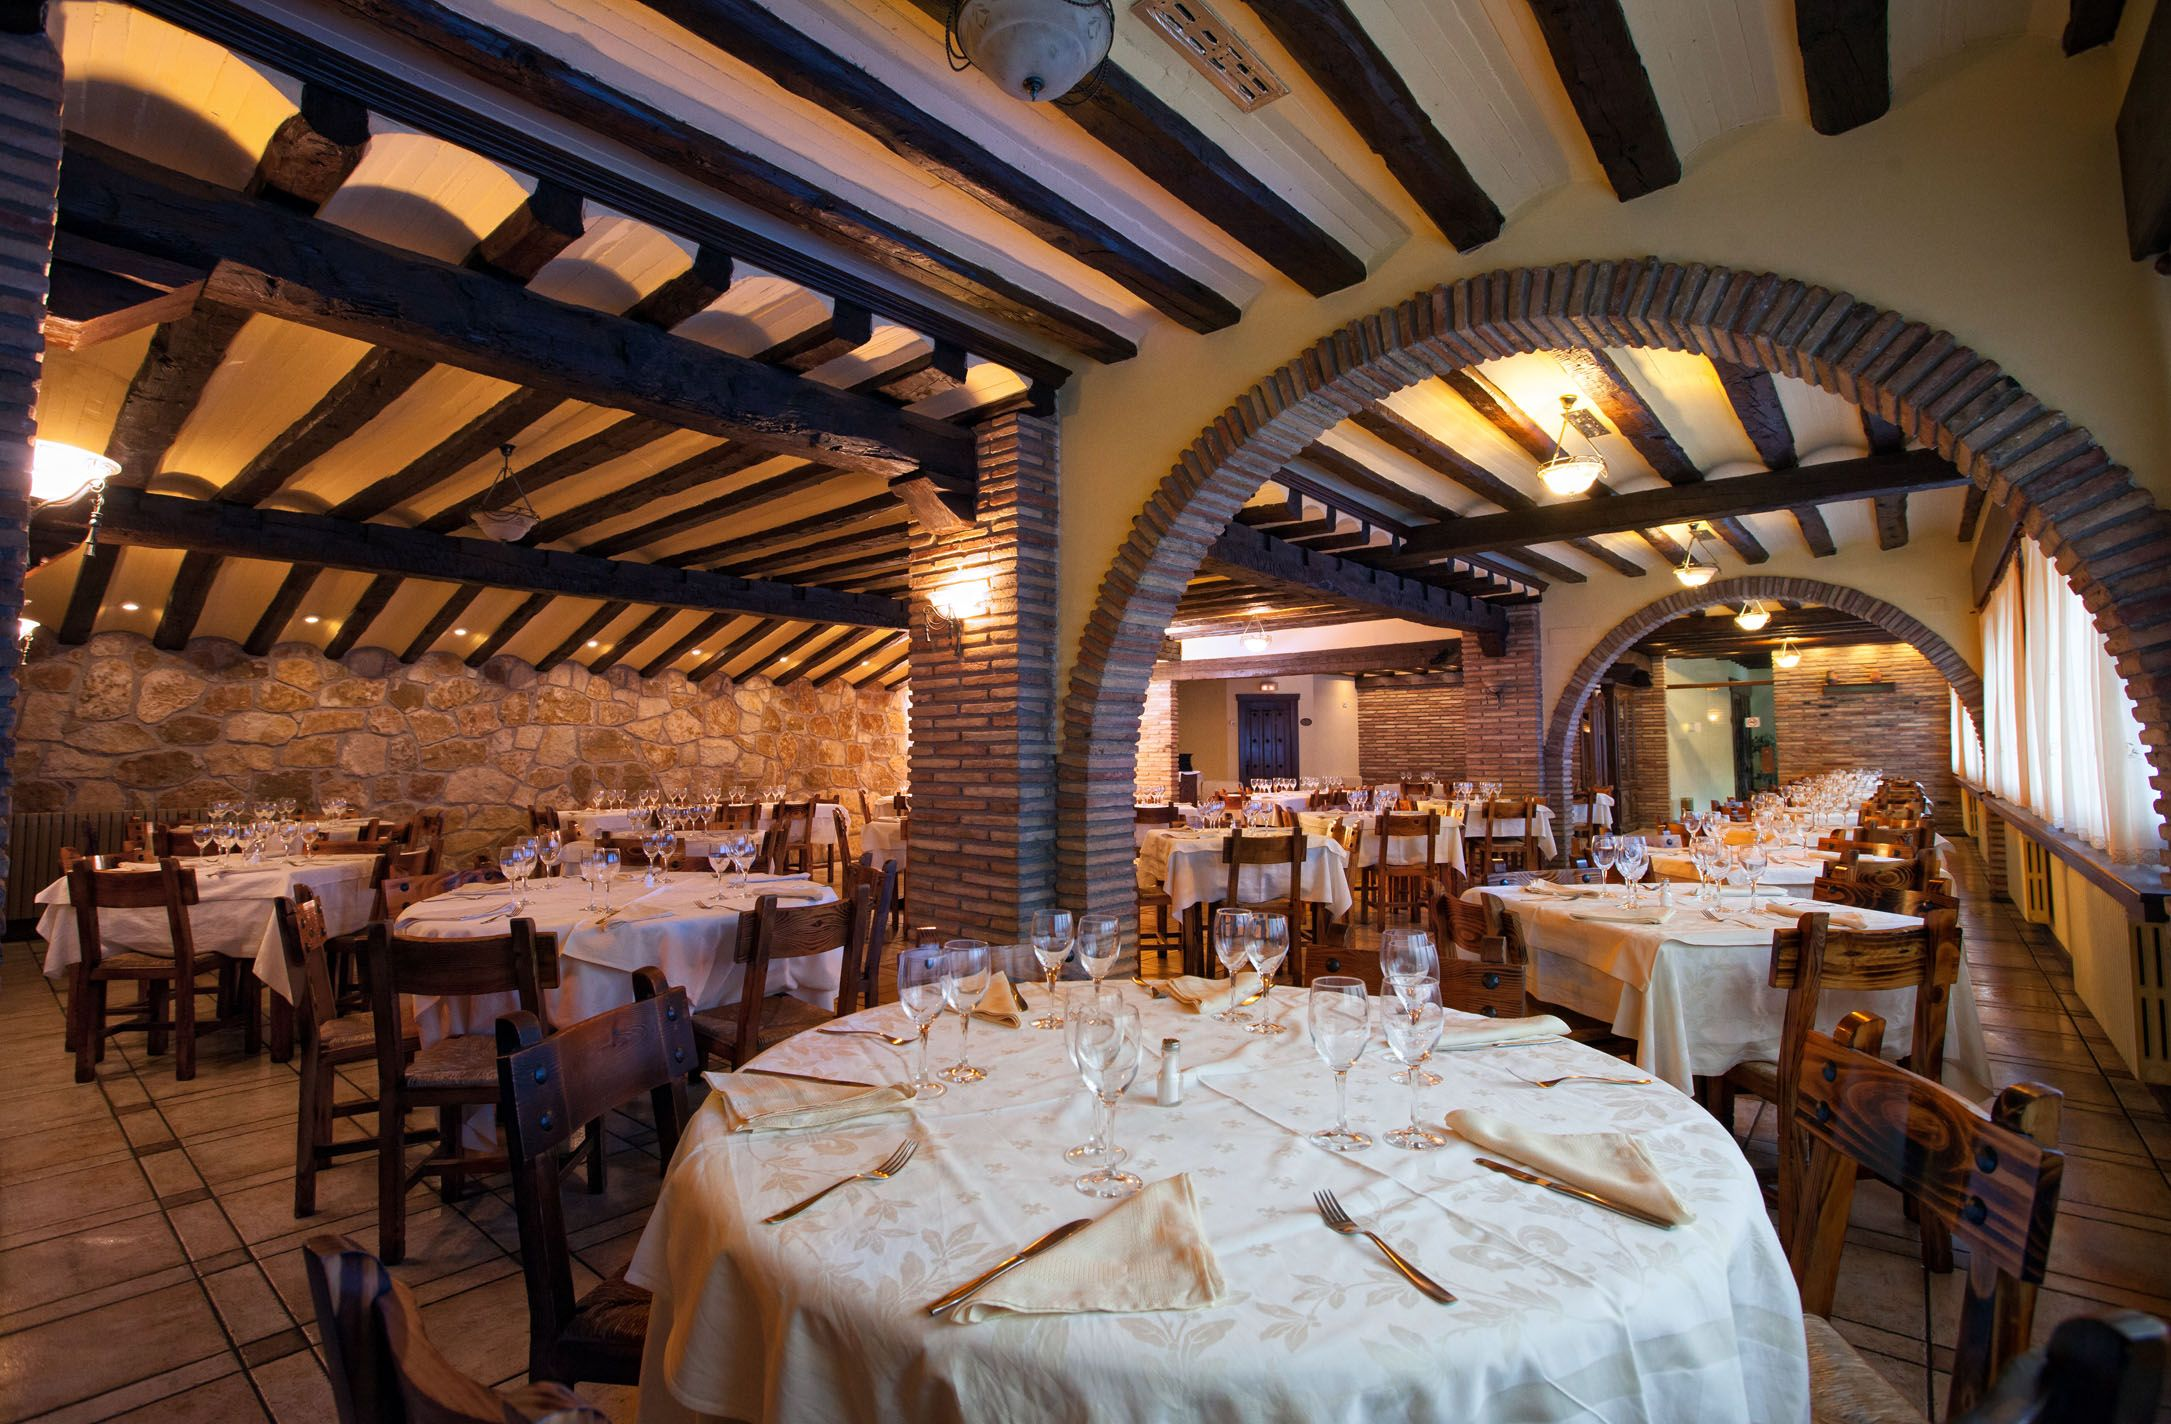 Restaurante: Servicios de Venta de Goyo